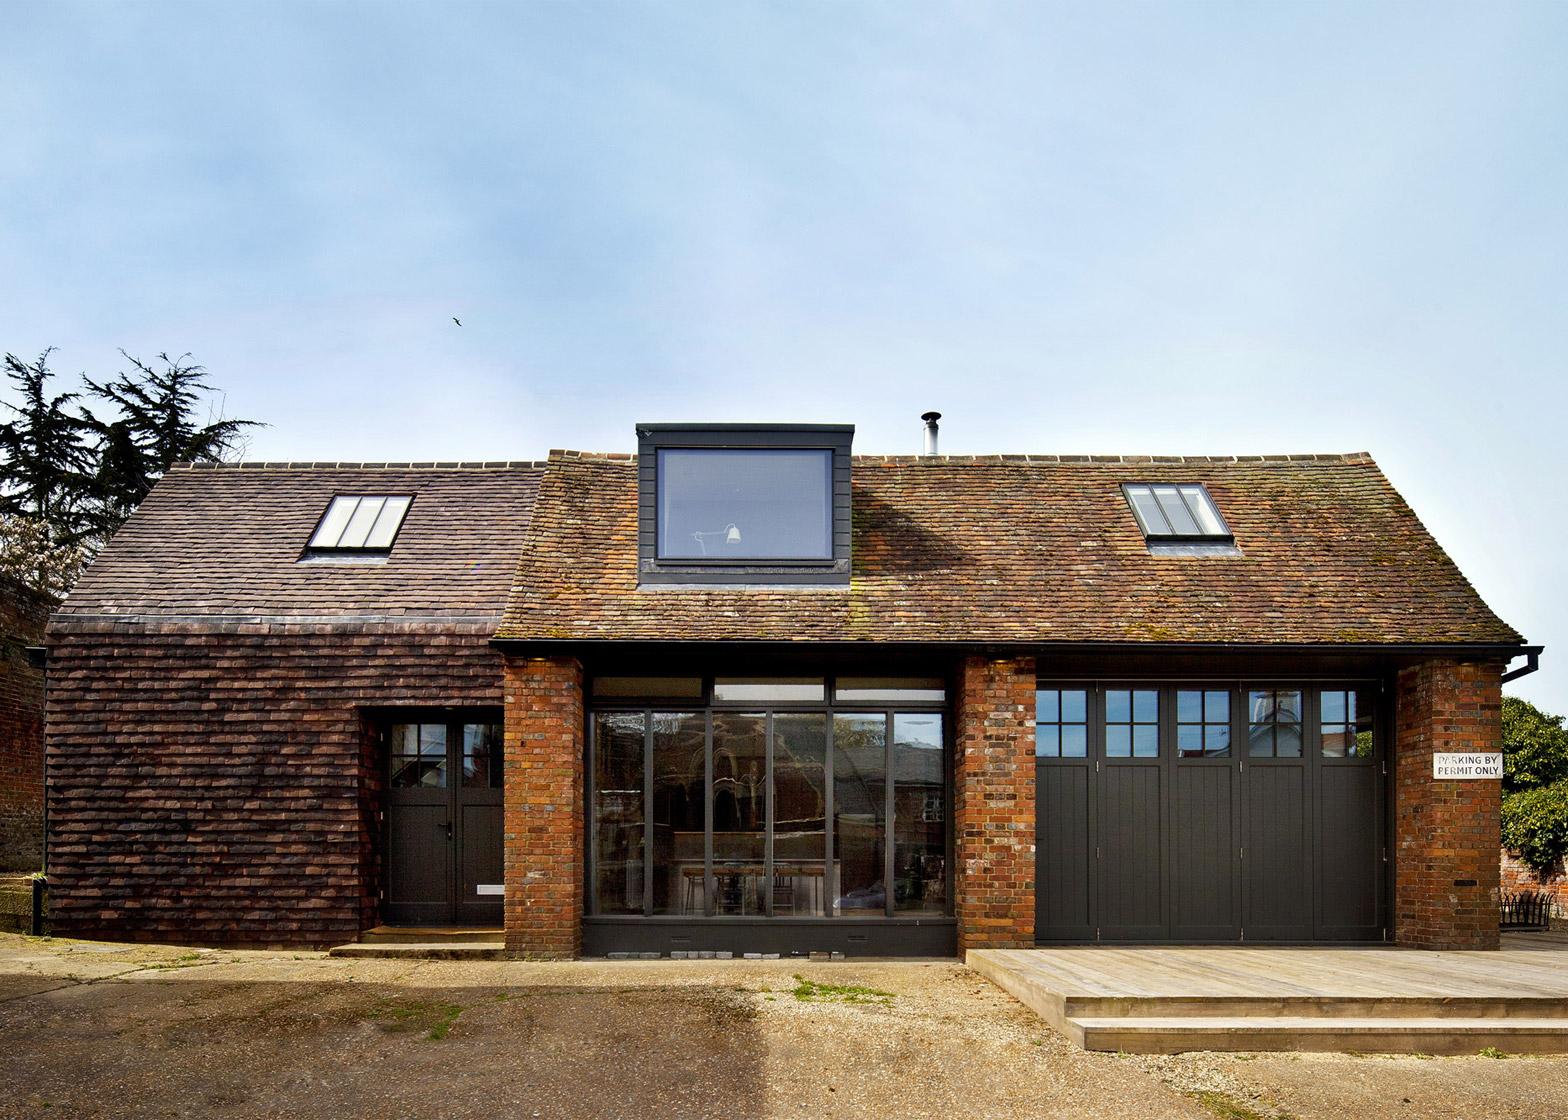 architecture_ambulance_house__design_studia_interiors_osnovadesign_osnova_poltava_10